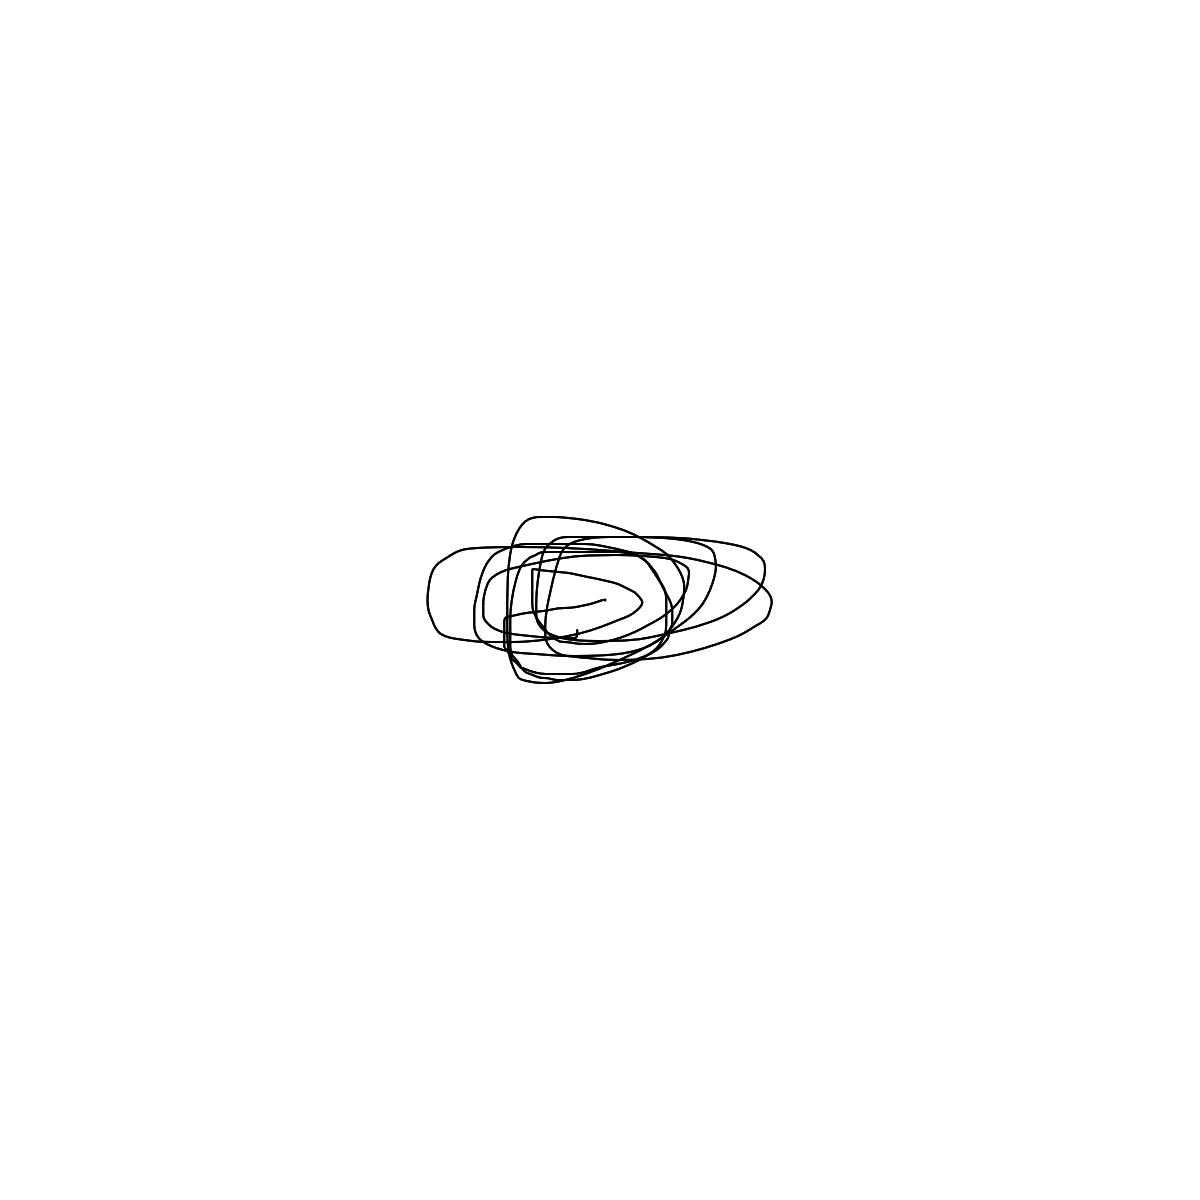 BAAAM drawing#17332 lat:45.5558624267578100lng: -73.6644439697265600